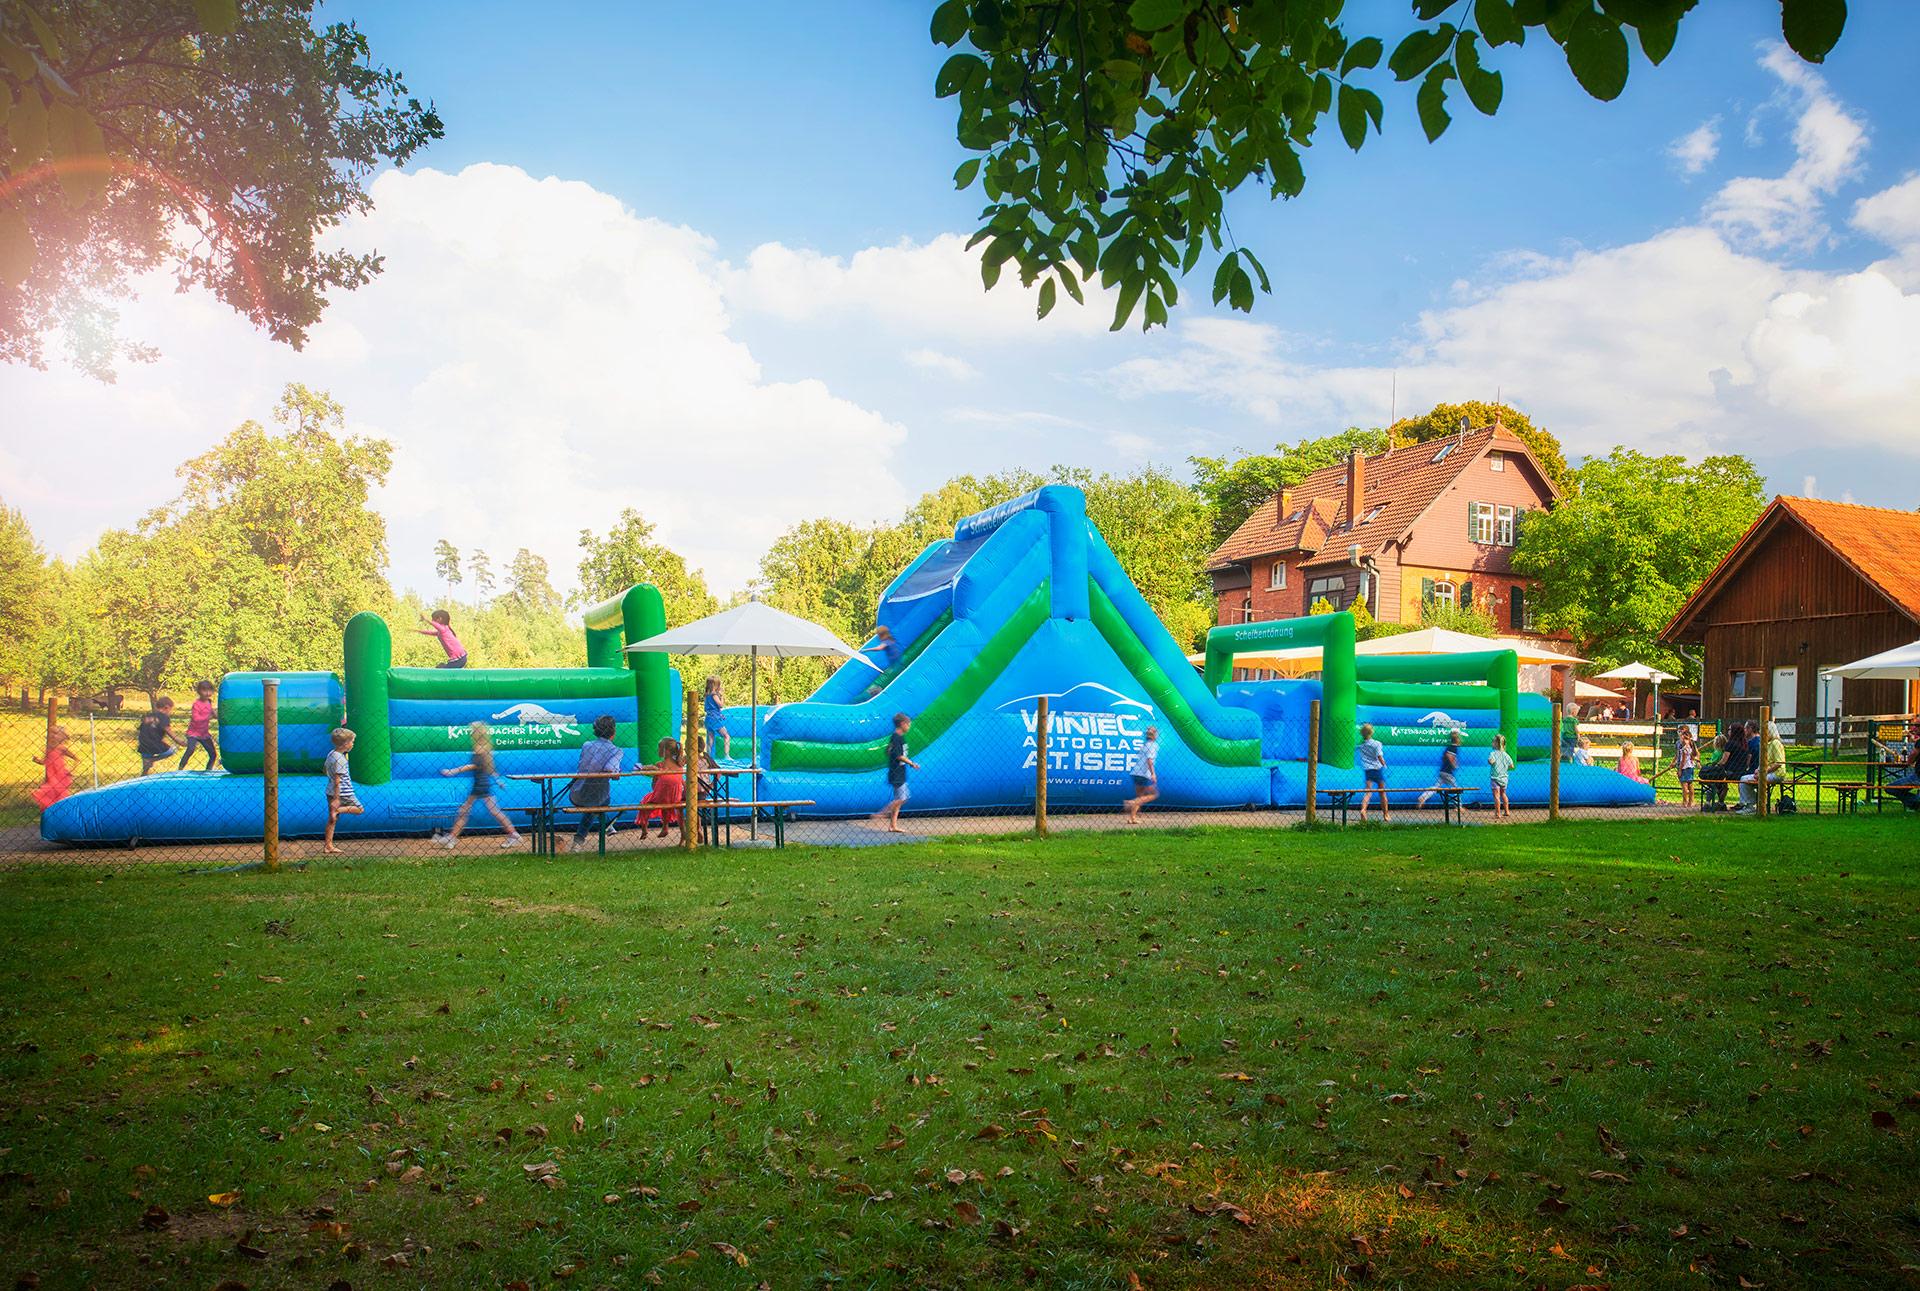 katzenbacher-hof-biergarten-kinderspielplatz